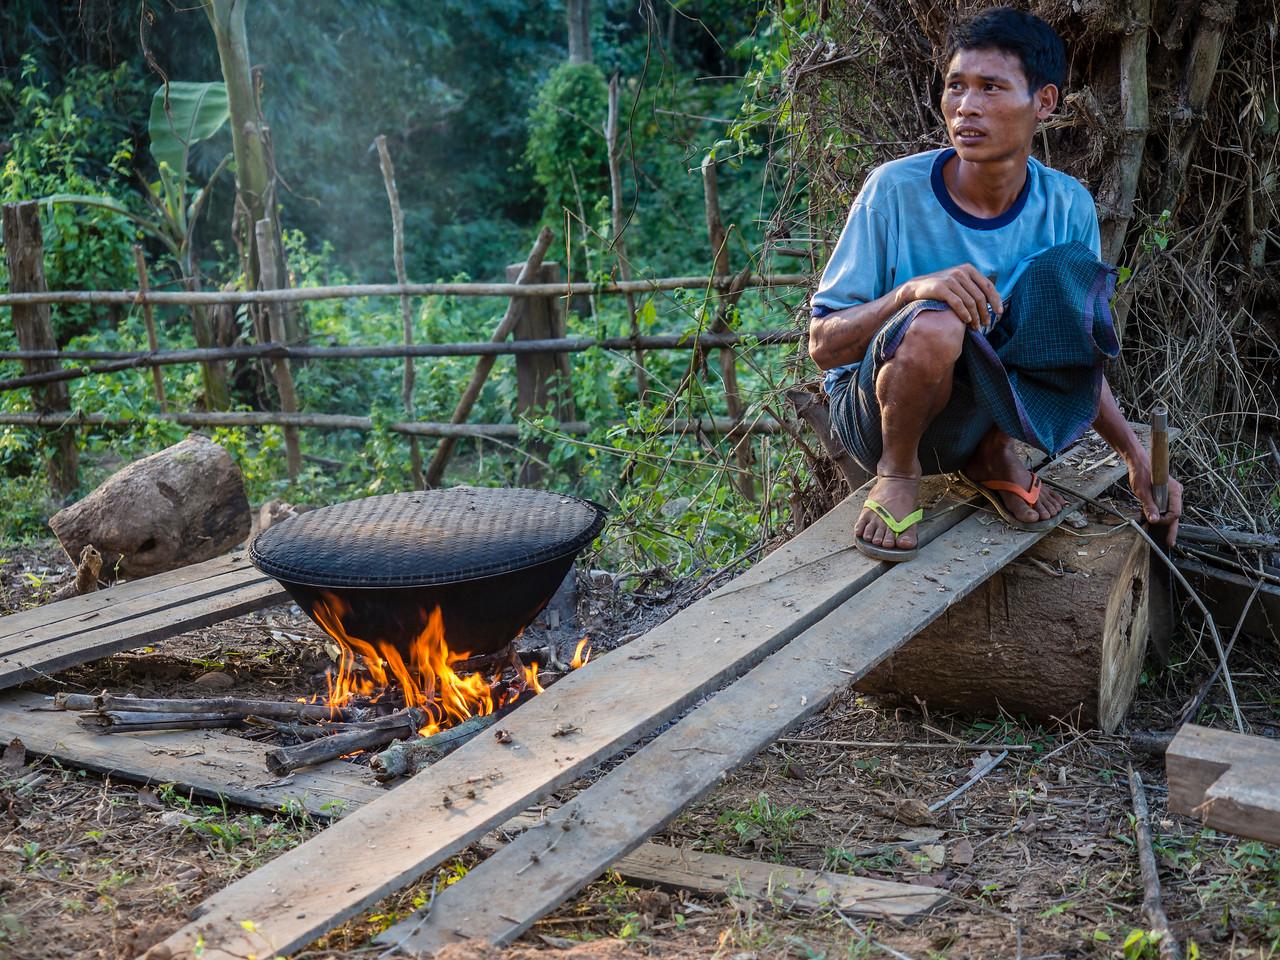 Boiling and shredding bamboo shoots, Shan village